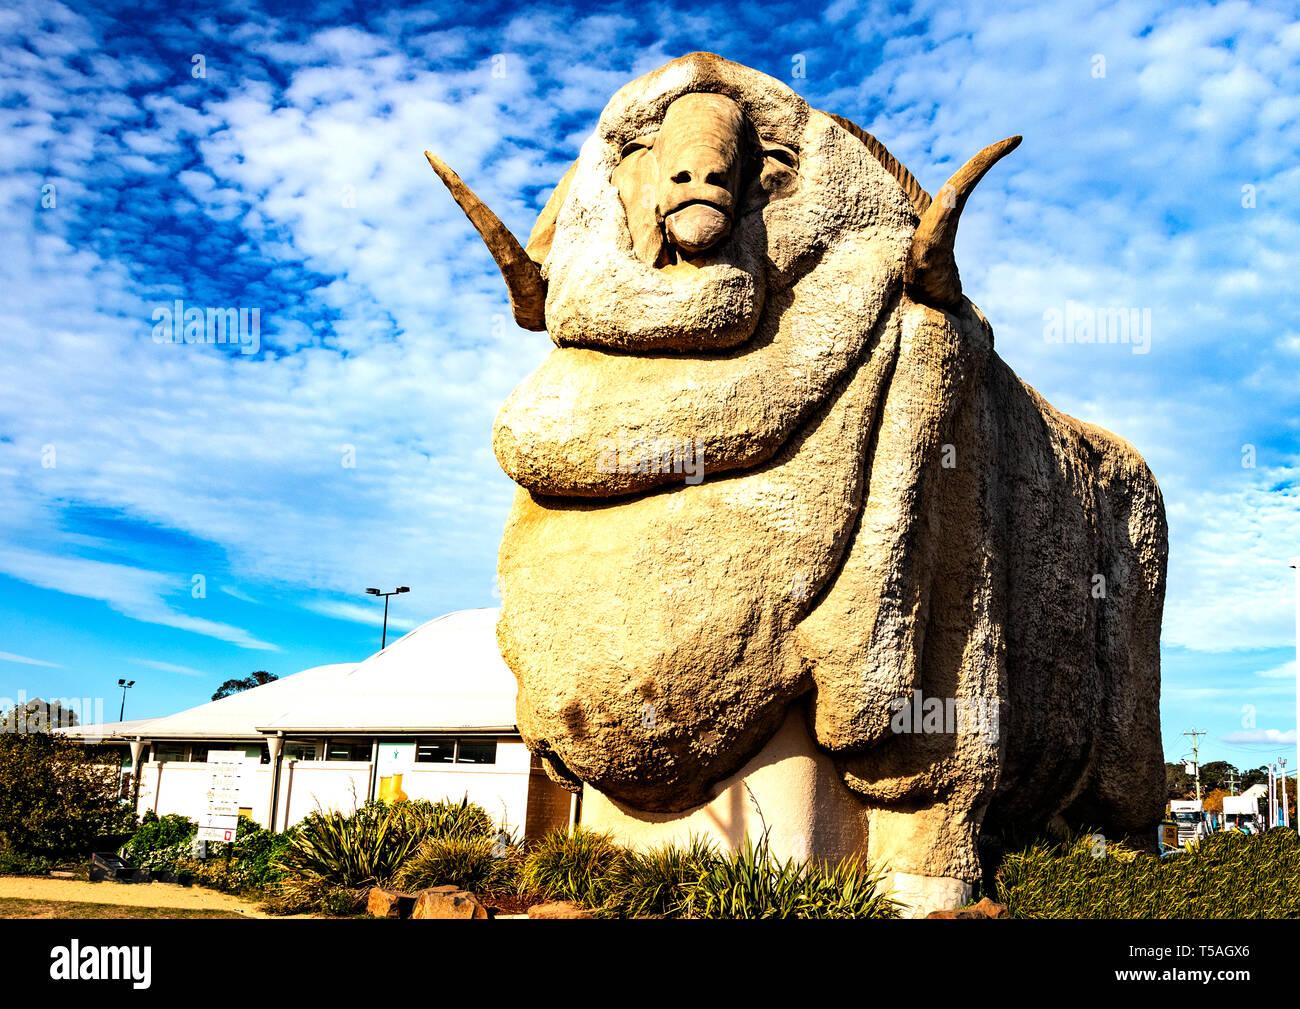 Big Merino statue in Goulburn, New South Wales, Australia - Stock Image